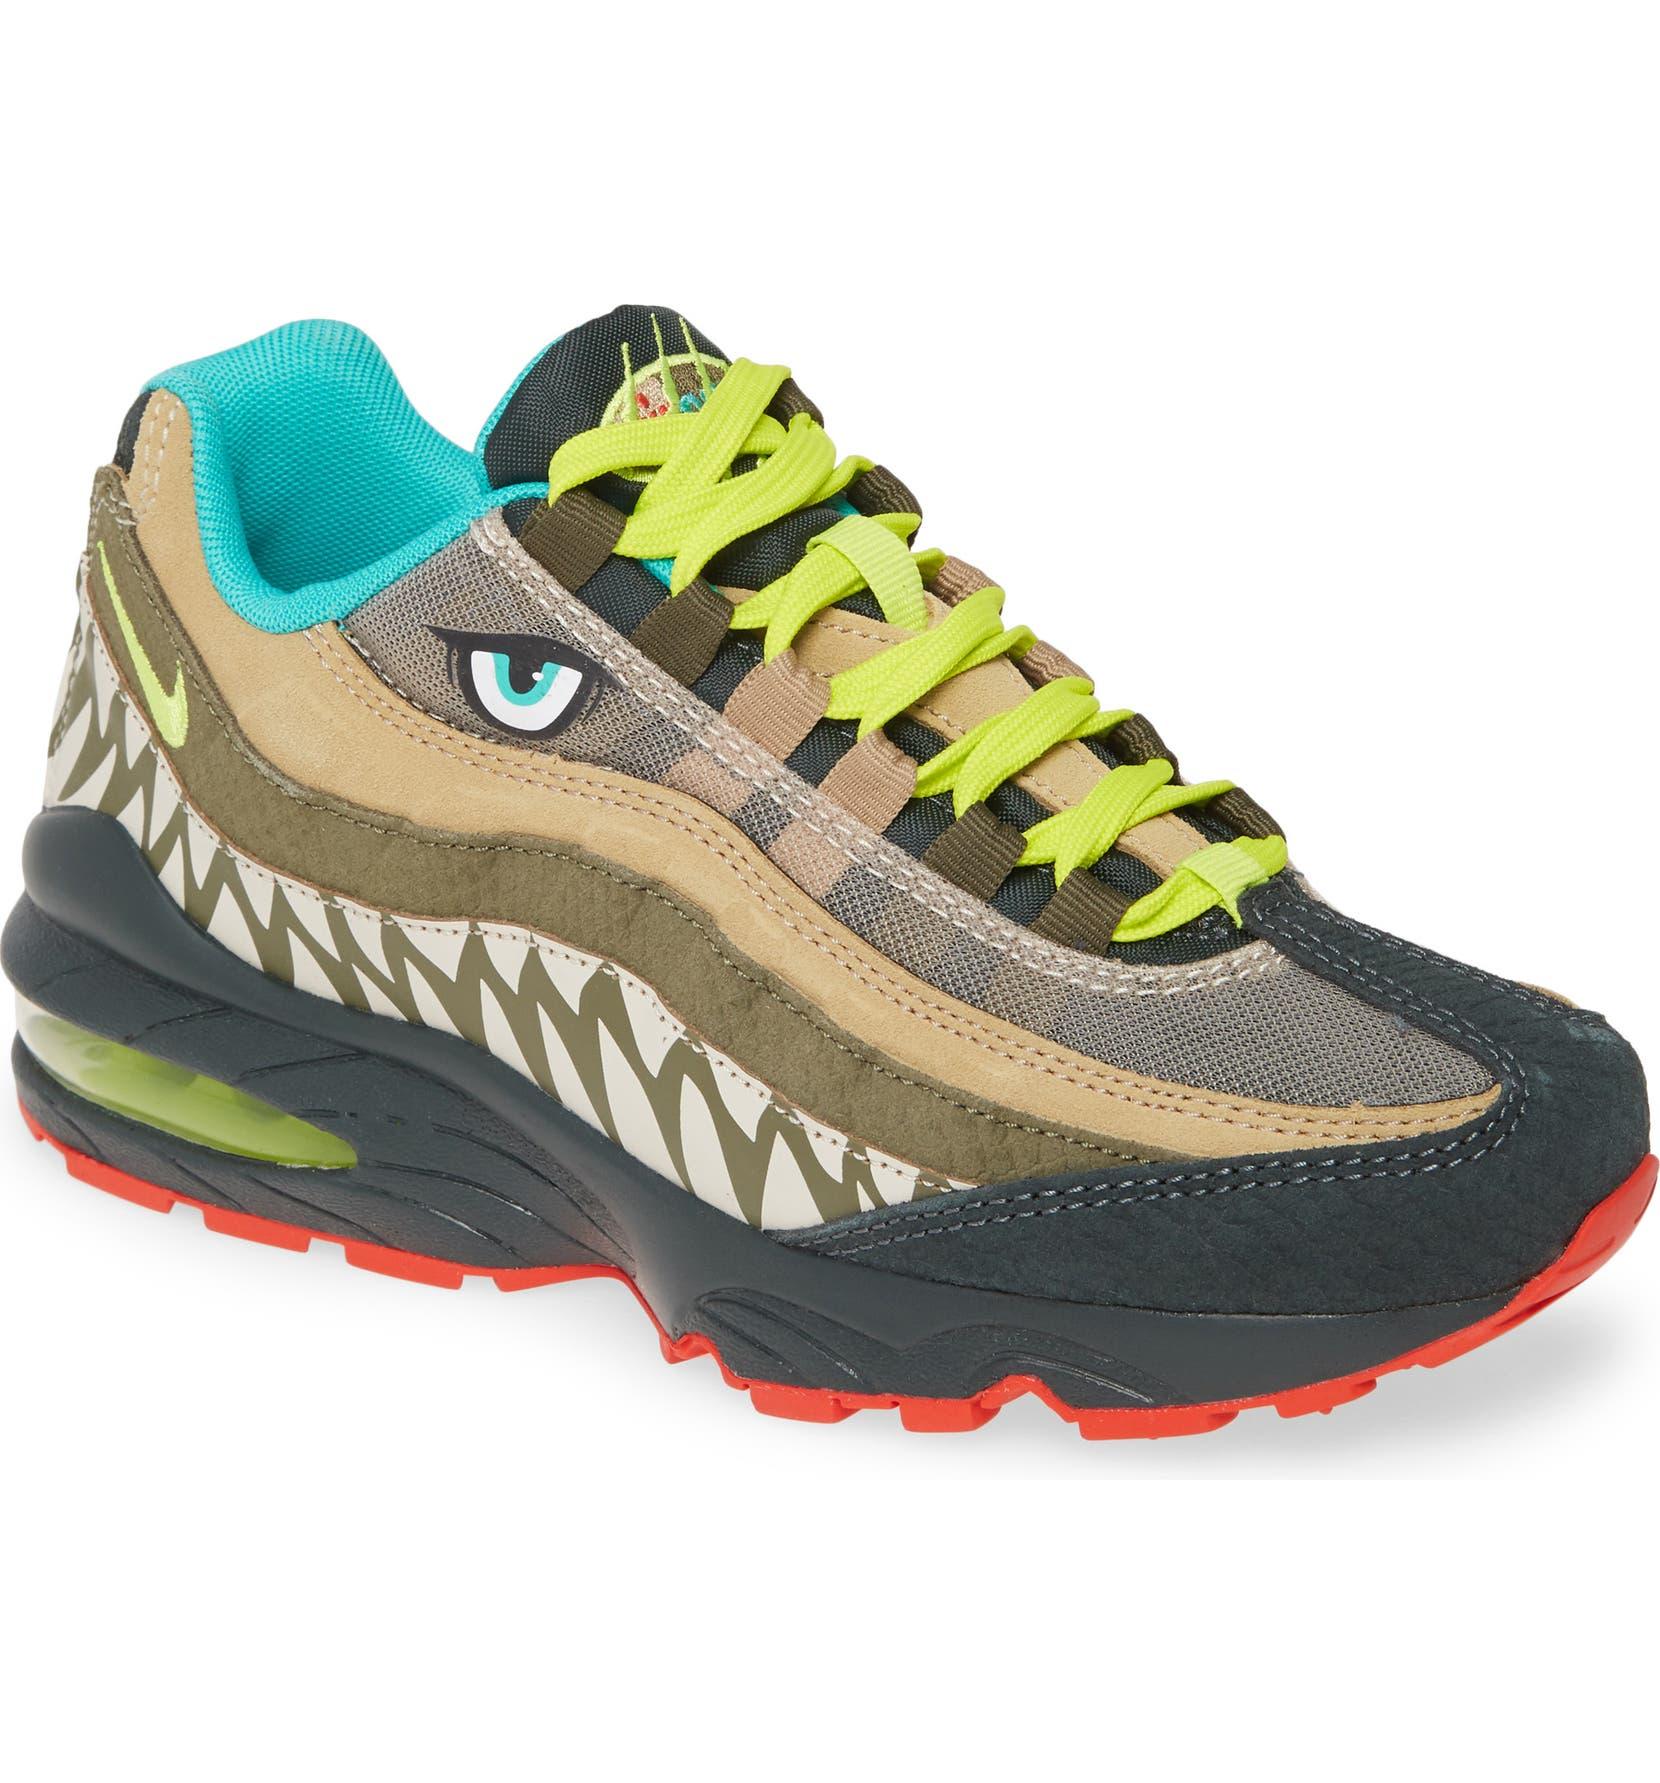 57b2b801409b9 Air Max 95 Sneaker